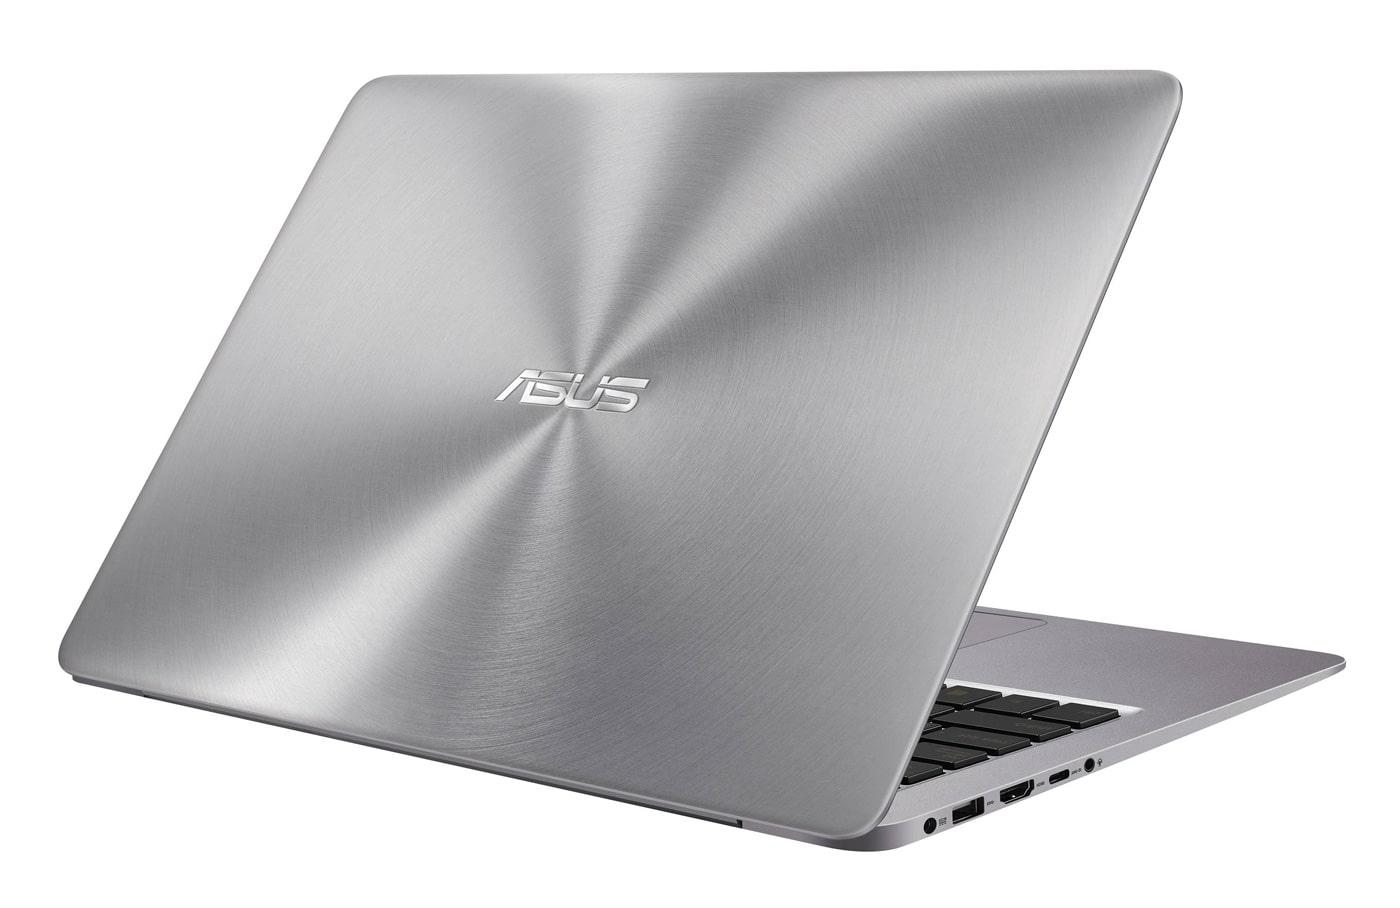 Asus Zenbook UX310UA-GL007T, ultrabook 13 pouces léger Core i5 (479€)